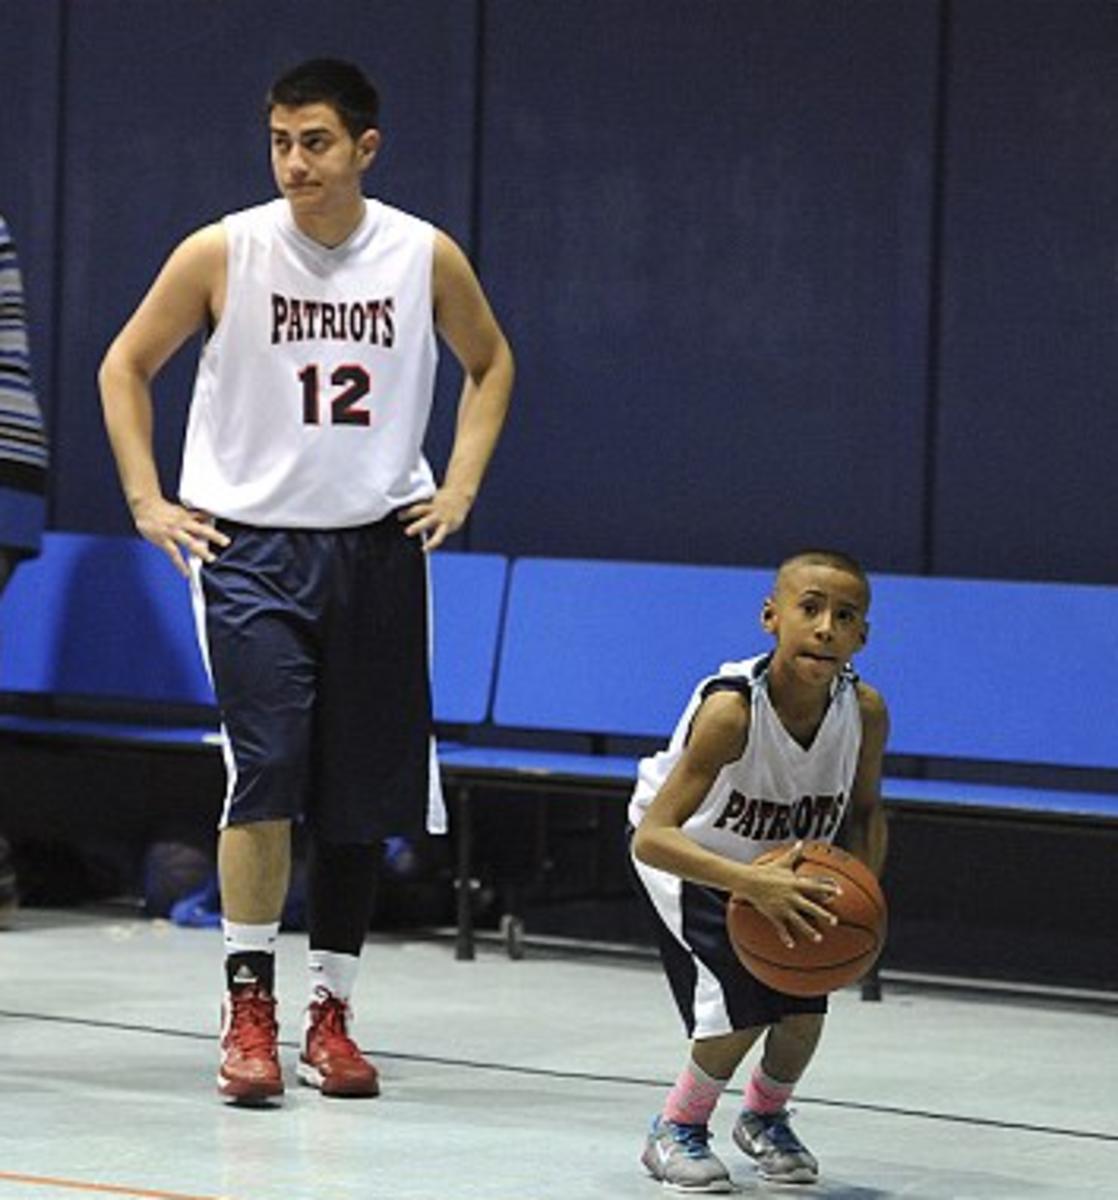 High School Basketball Star Julian Newman Is 11 And Stands